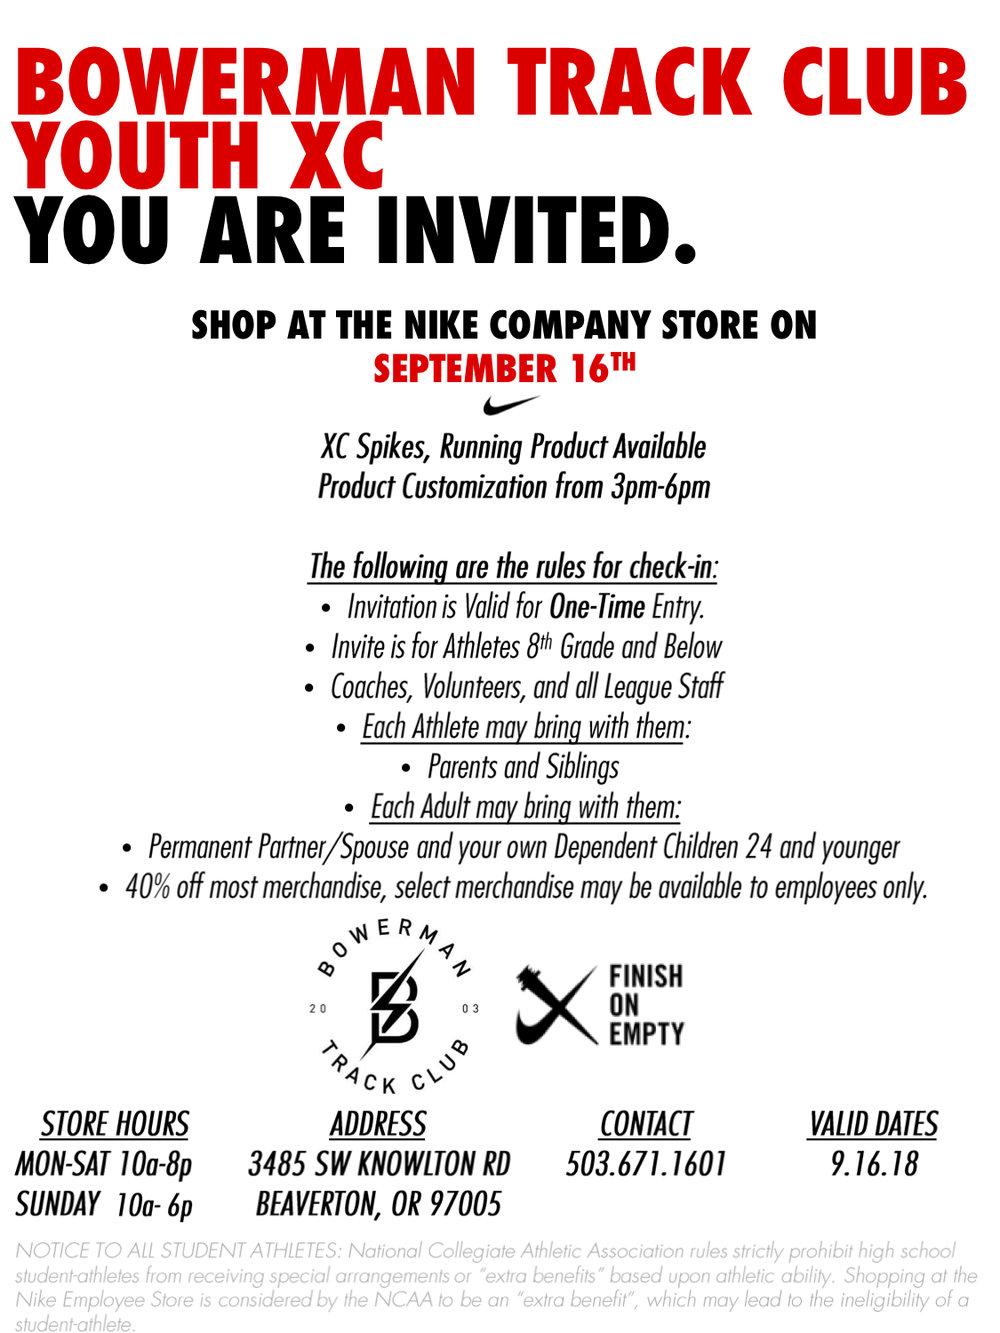 Bowerman TC Youth XC Invite.jpg